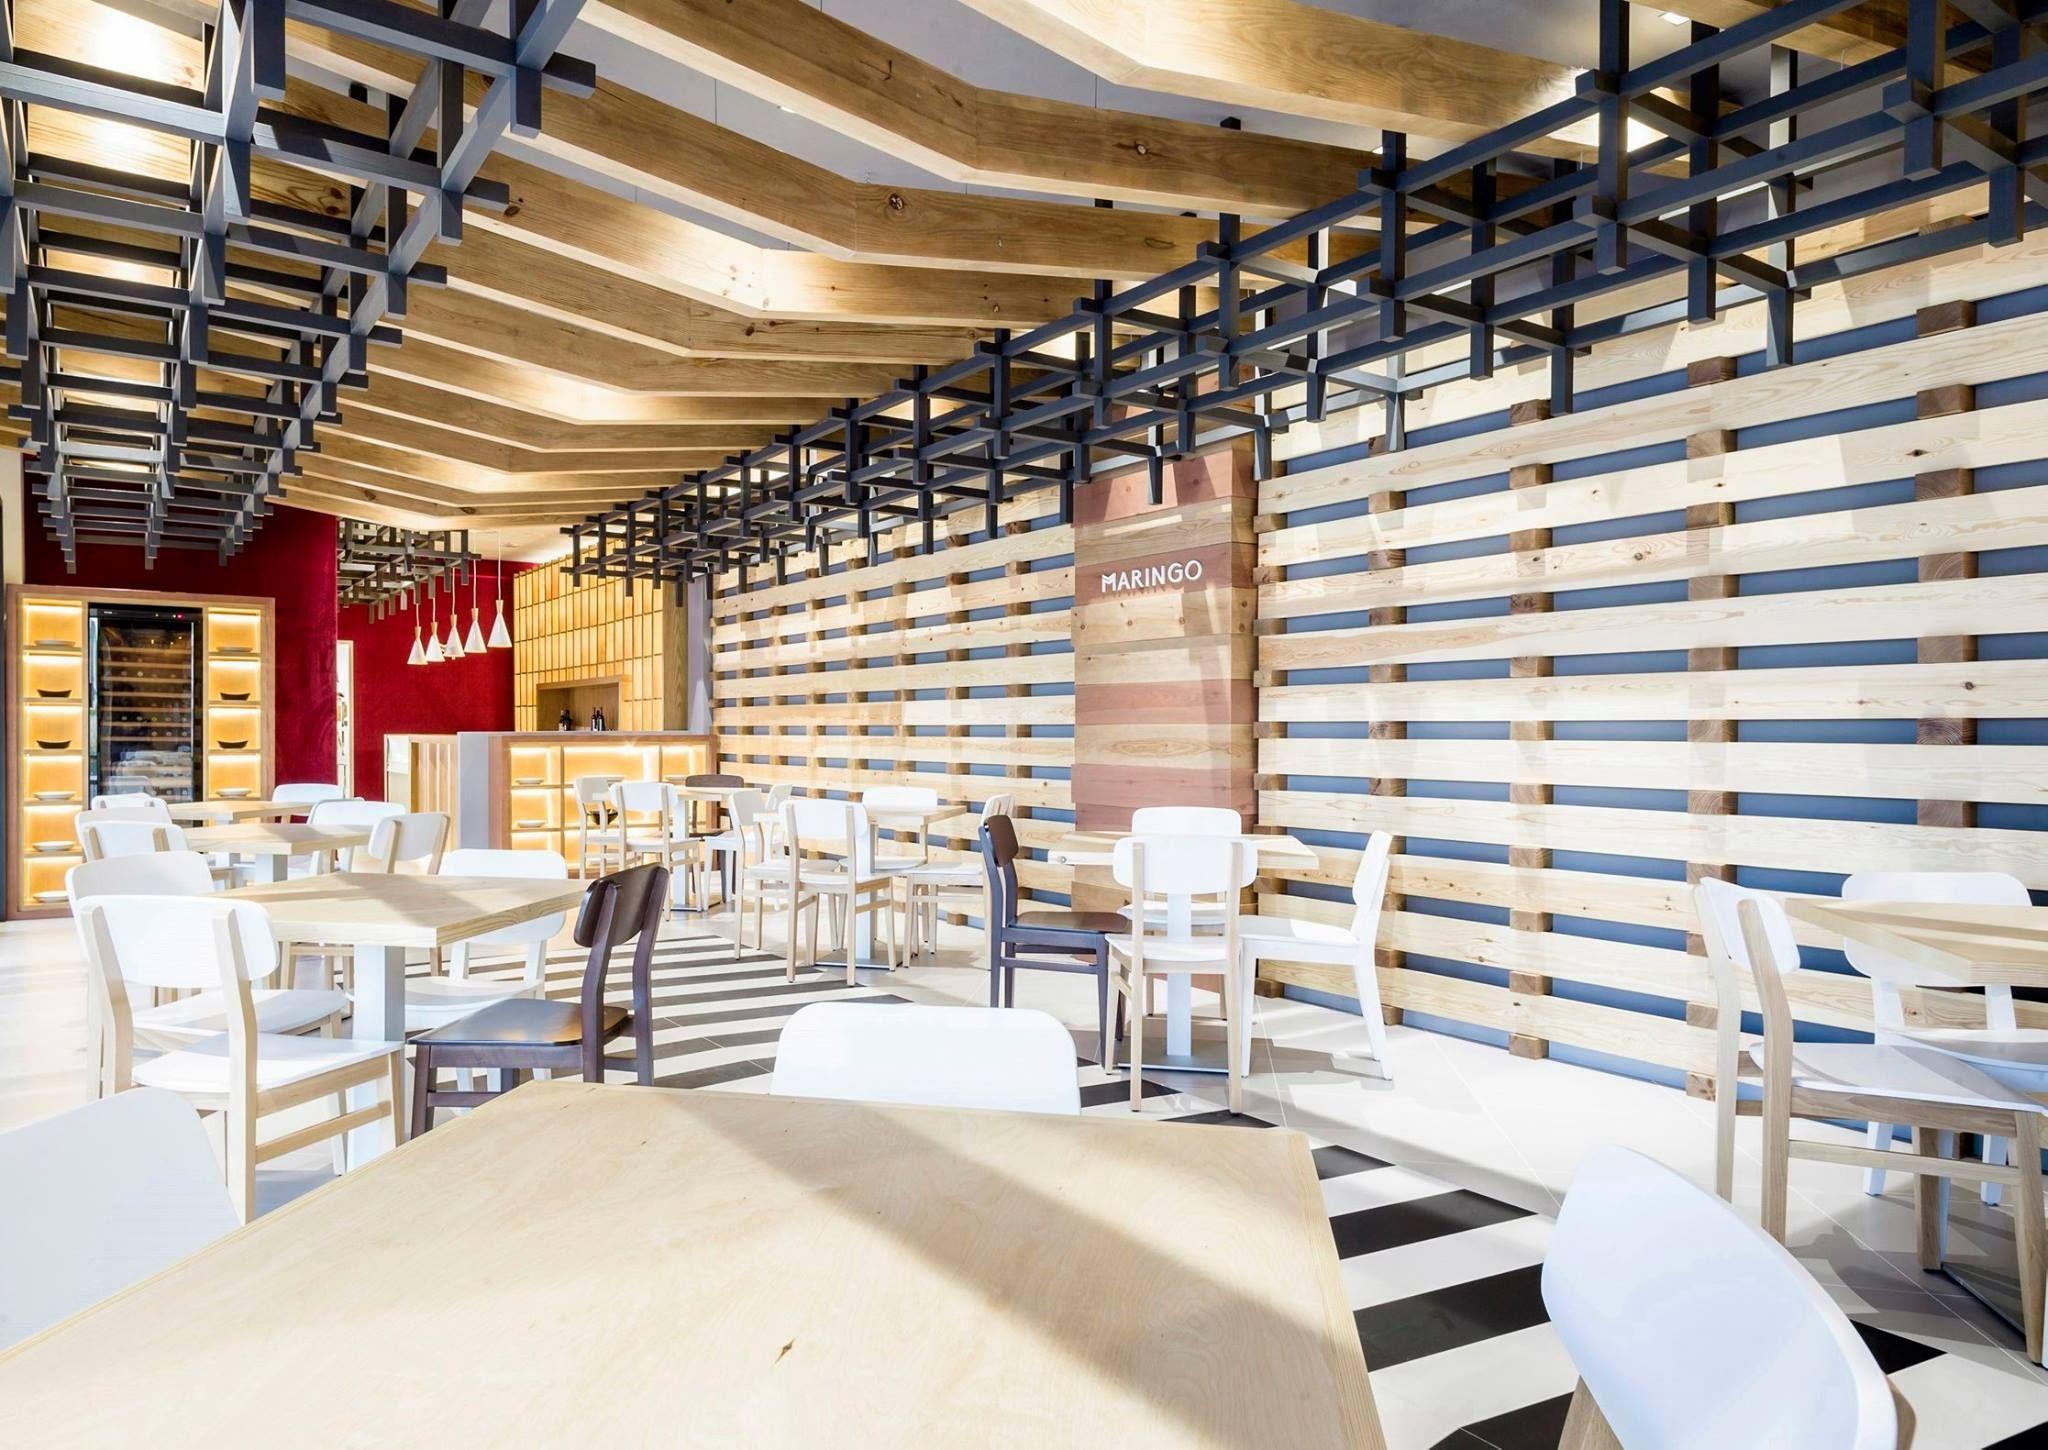 Mediterranean cuisine in Conil de la Frontera